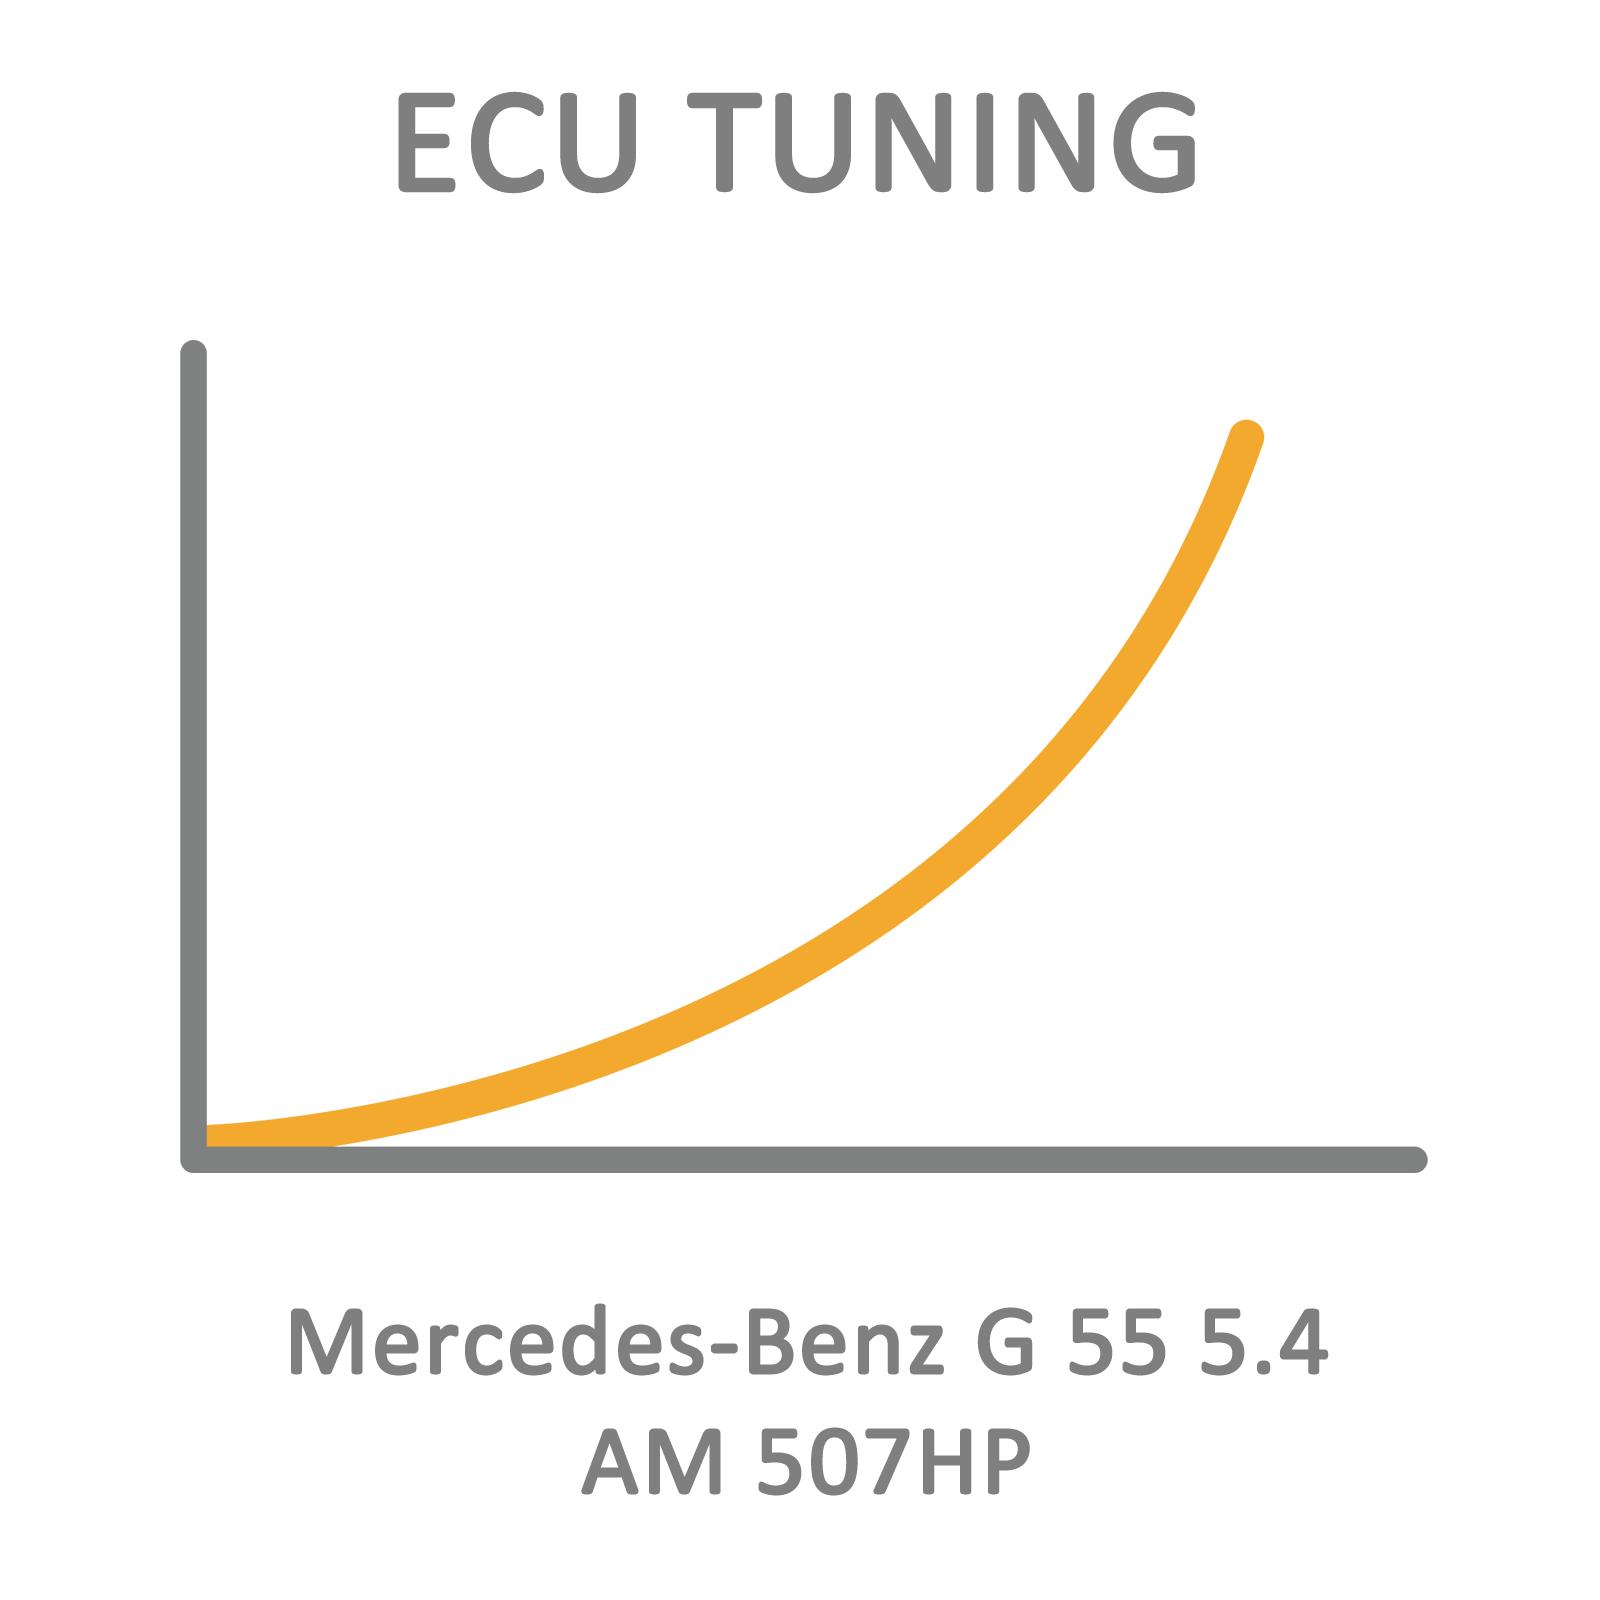 Mercedes-Benz G 55 5.4 AM 507HP ECU Tuning Remapping